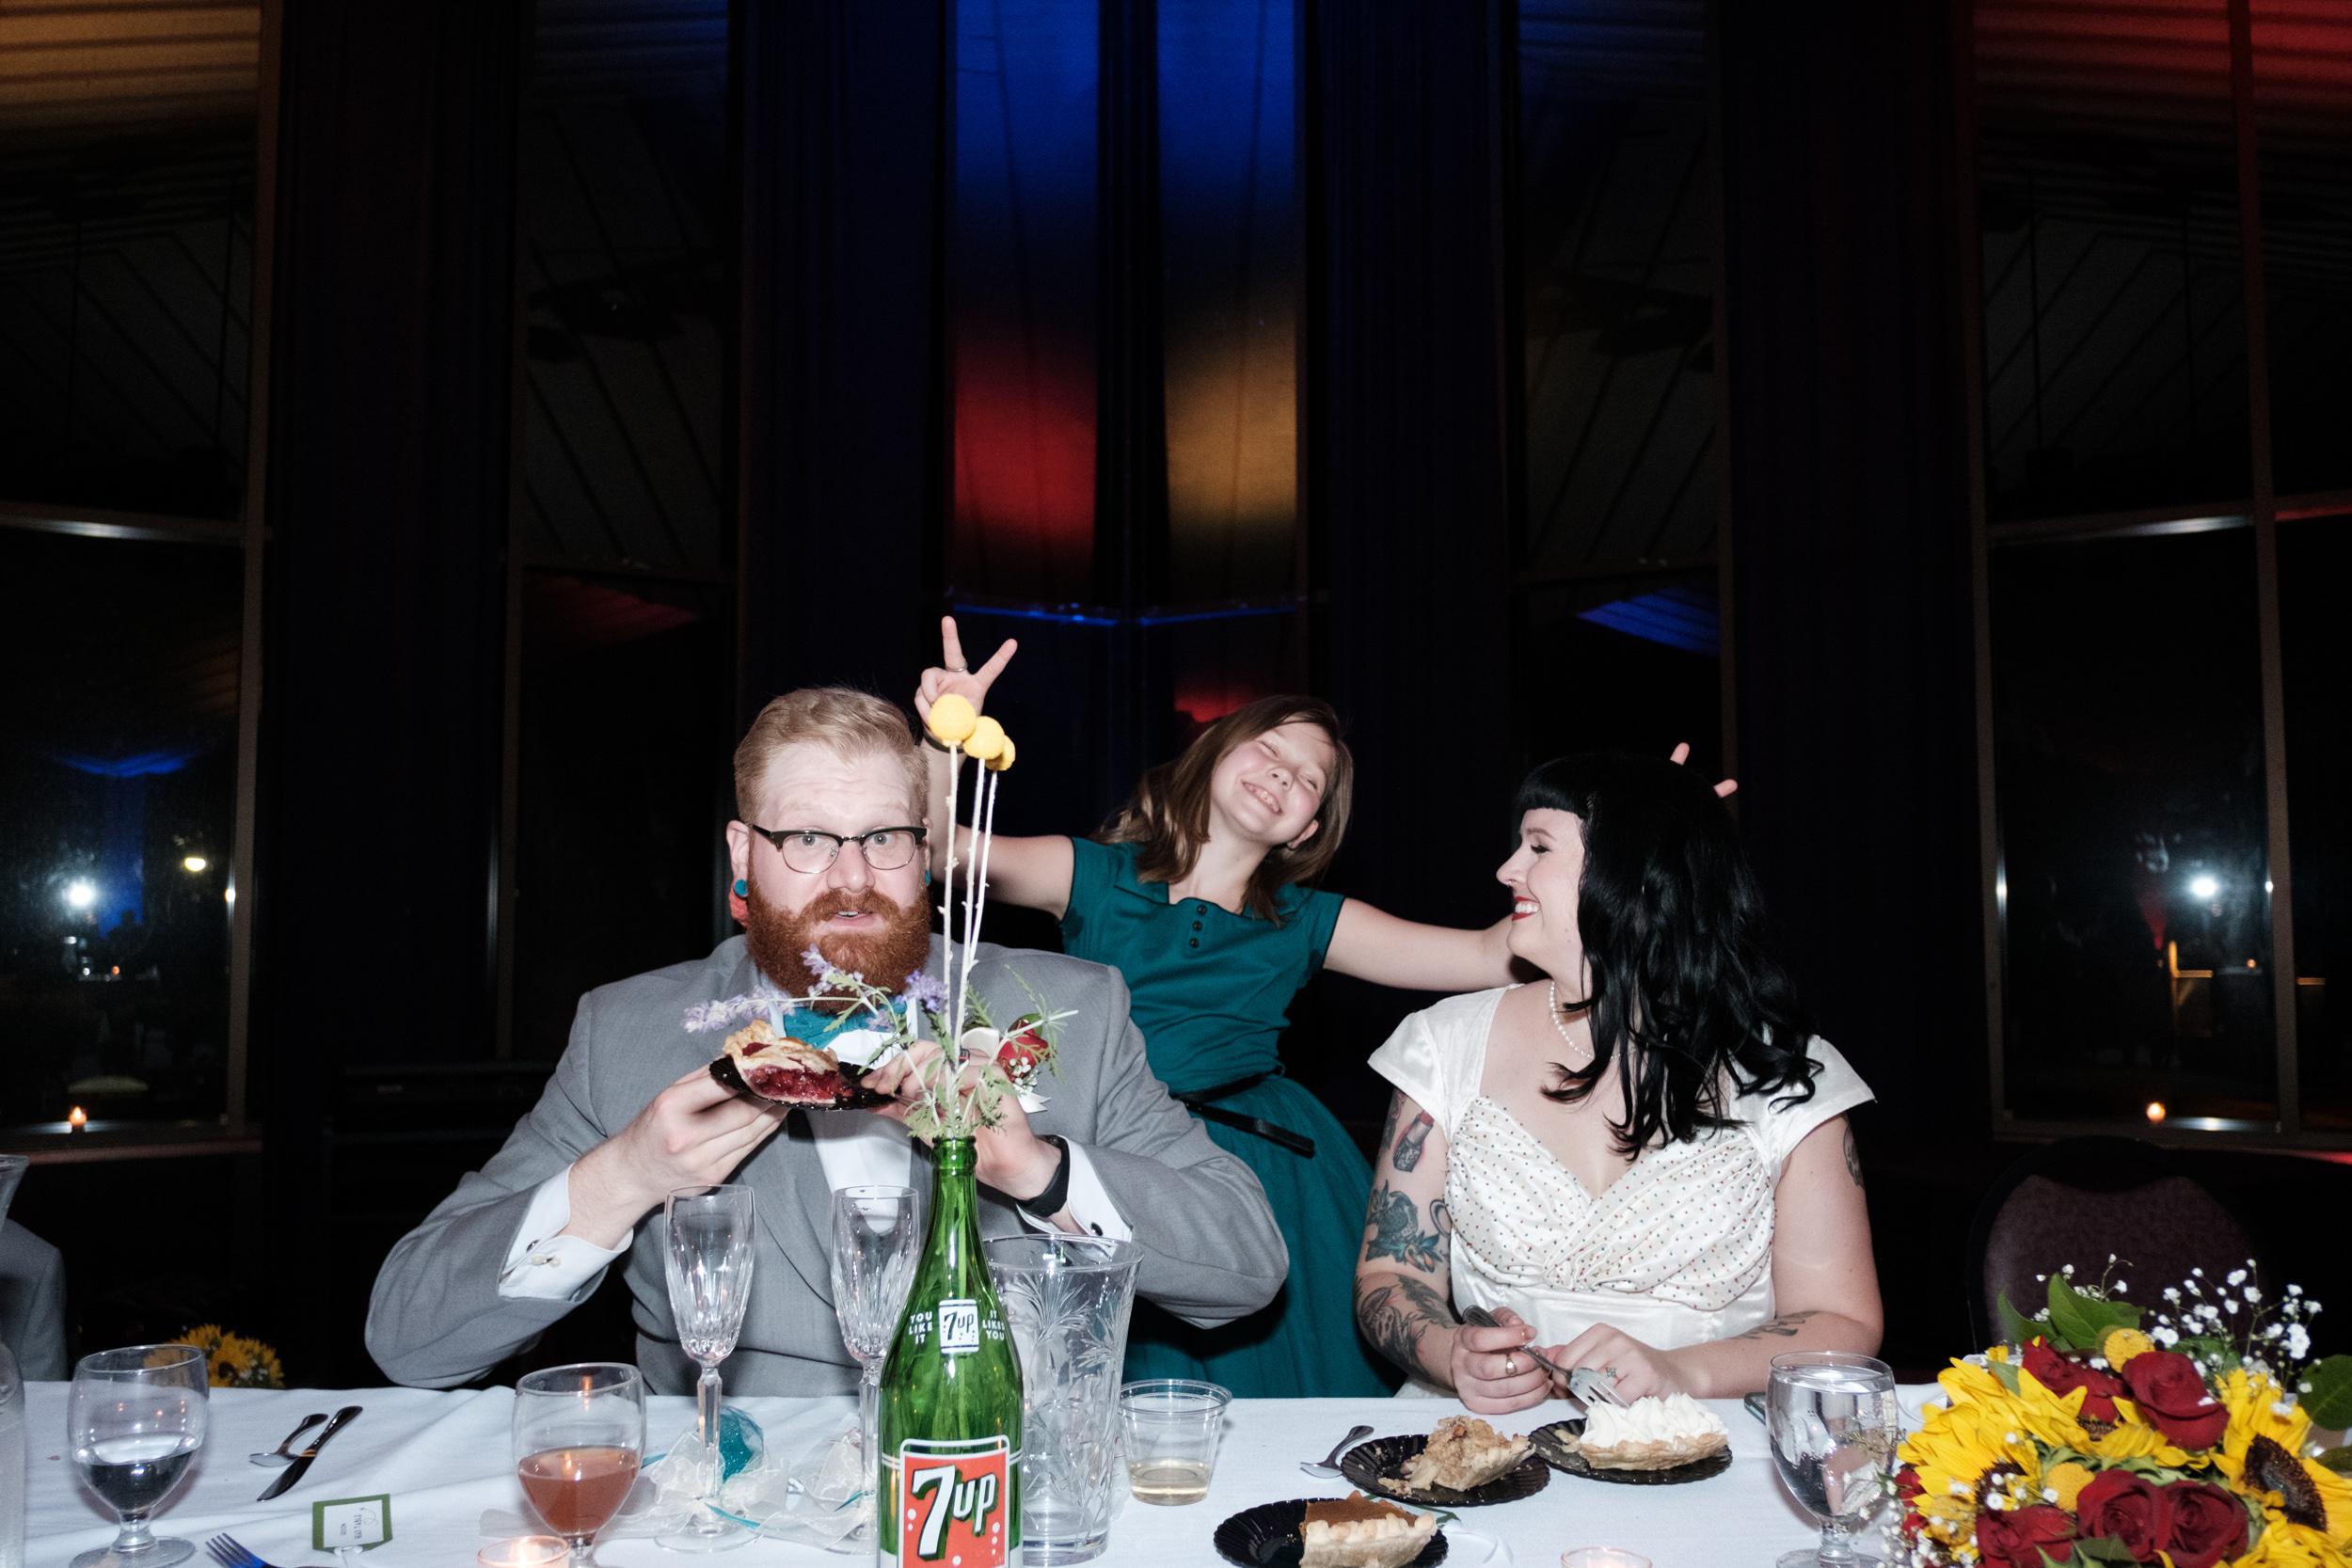 Christian & Sarah wedding photography by Brian milo-241.jpg